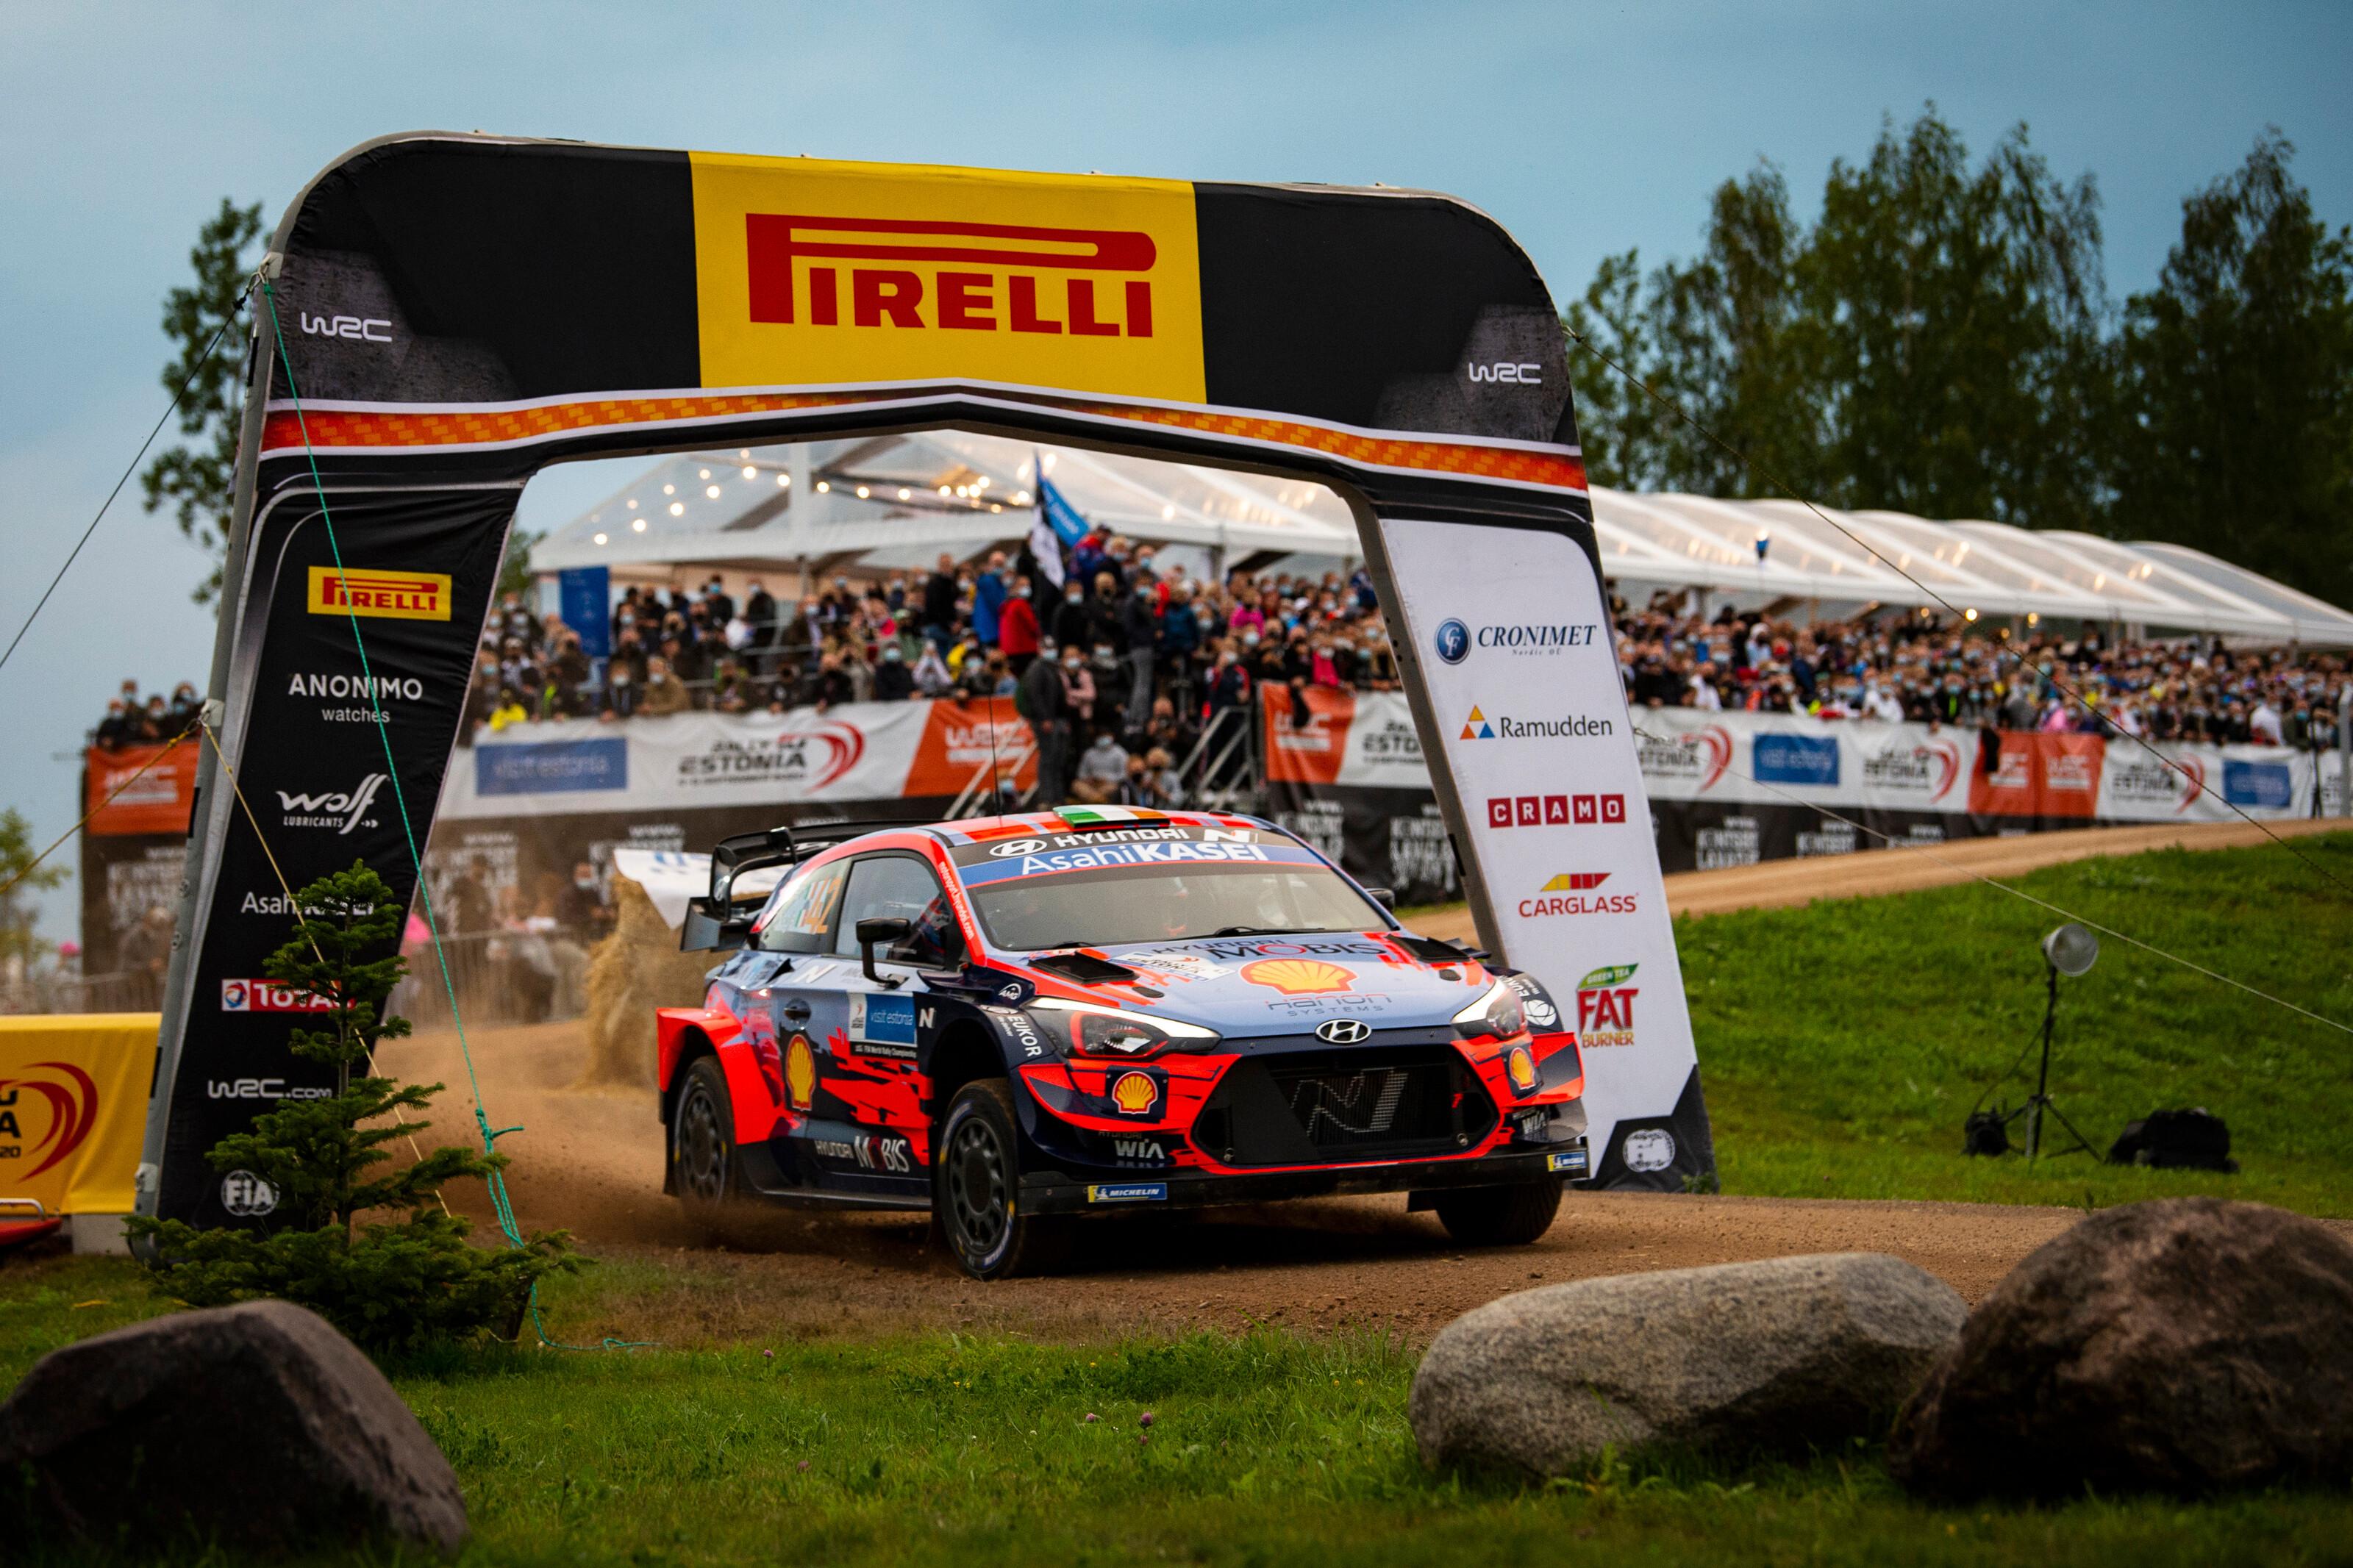 WRC: 10º Rallye Estonia [4-6 Septiembre] - Página 3 EhIn1HvUcAIo4tw?format=jpg&name=4096x4096